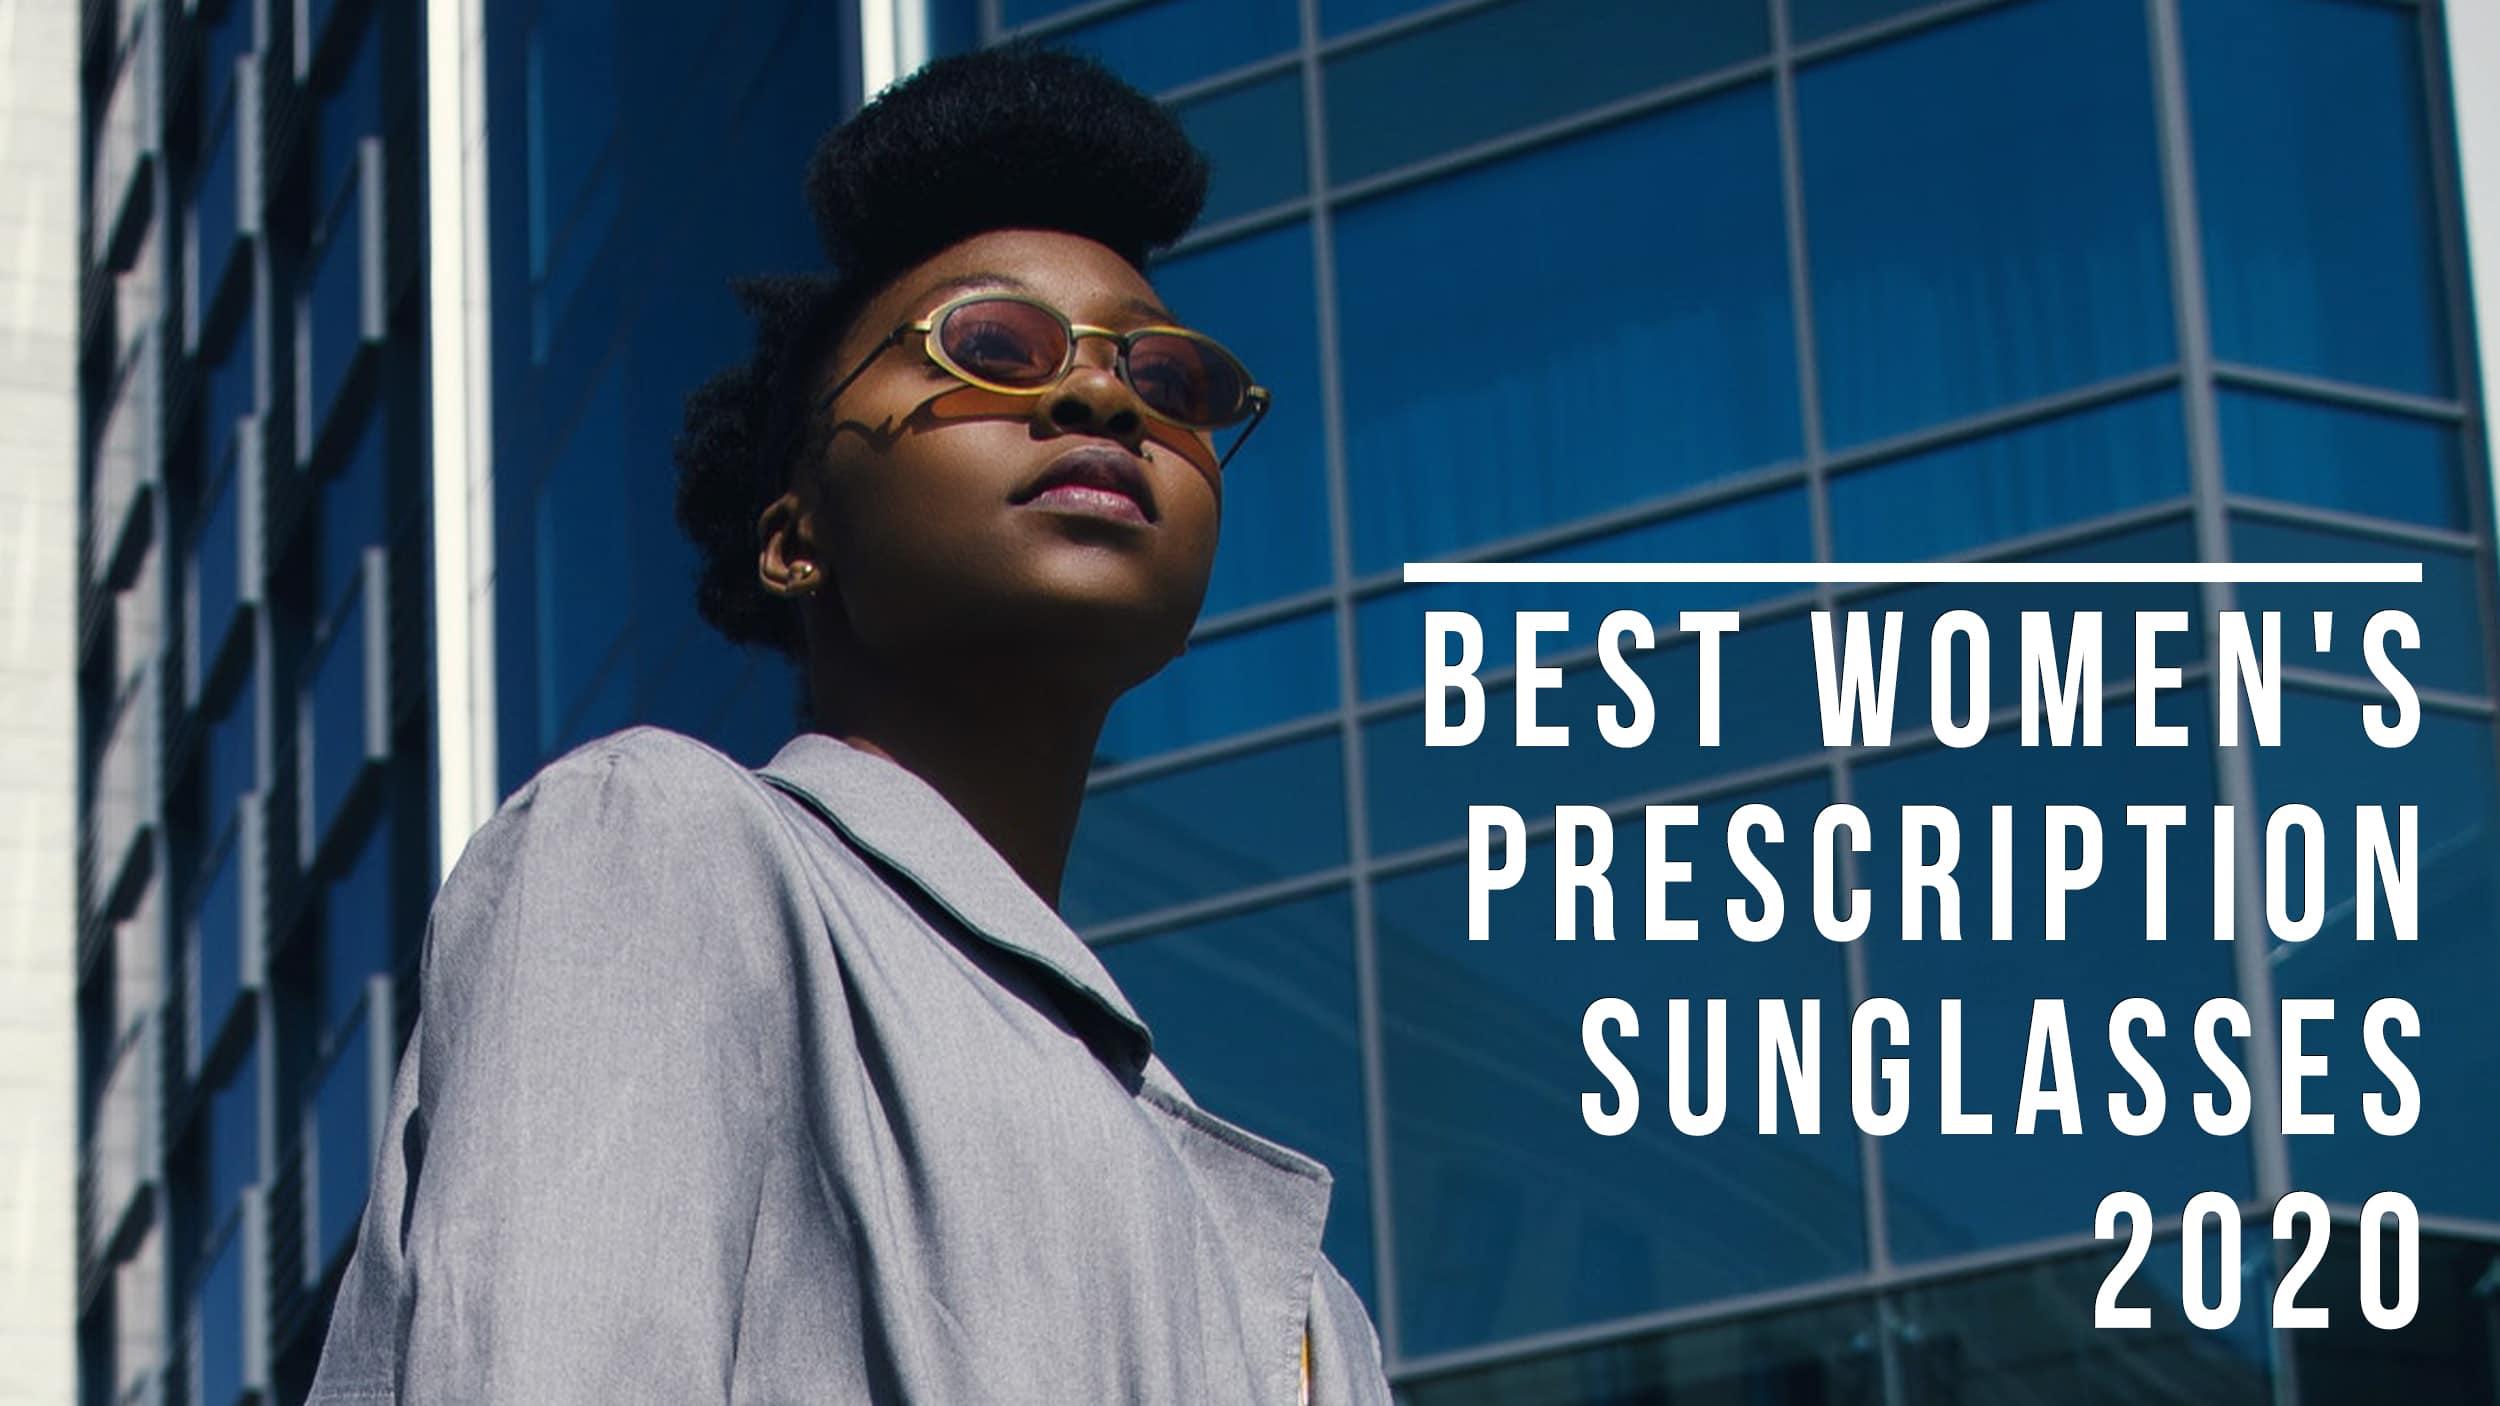 Best Women's Prescription sunglasses Header